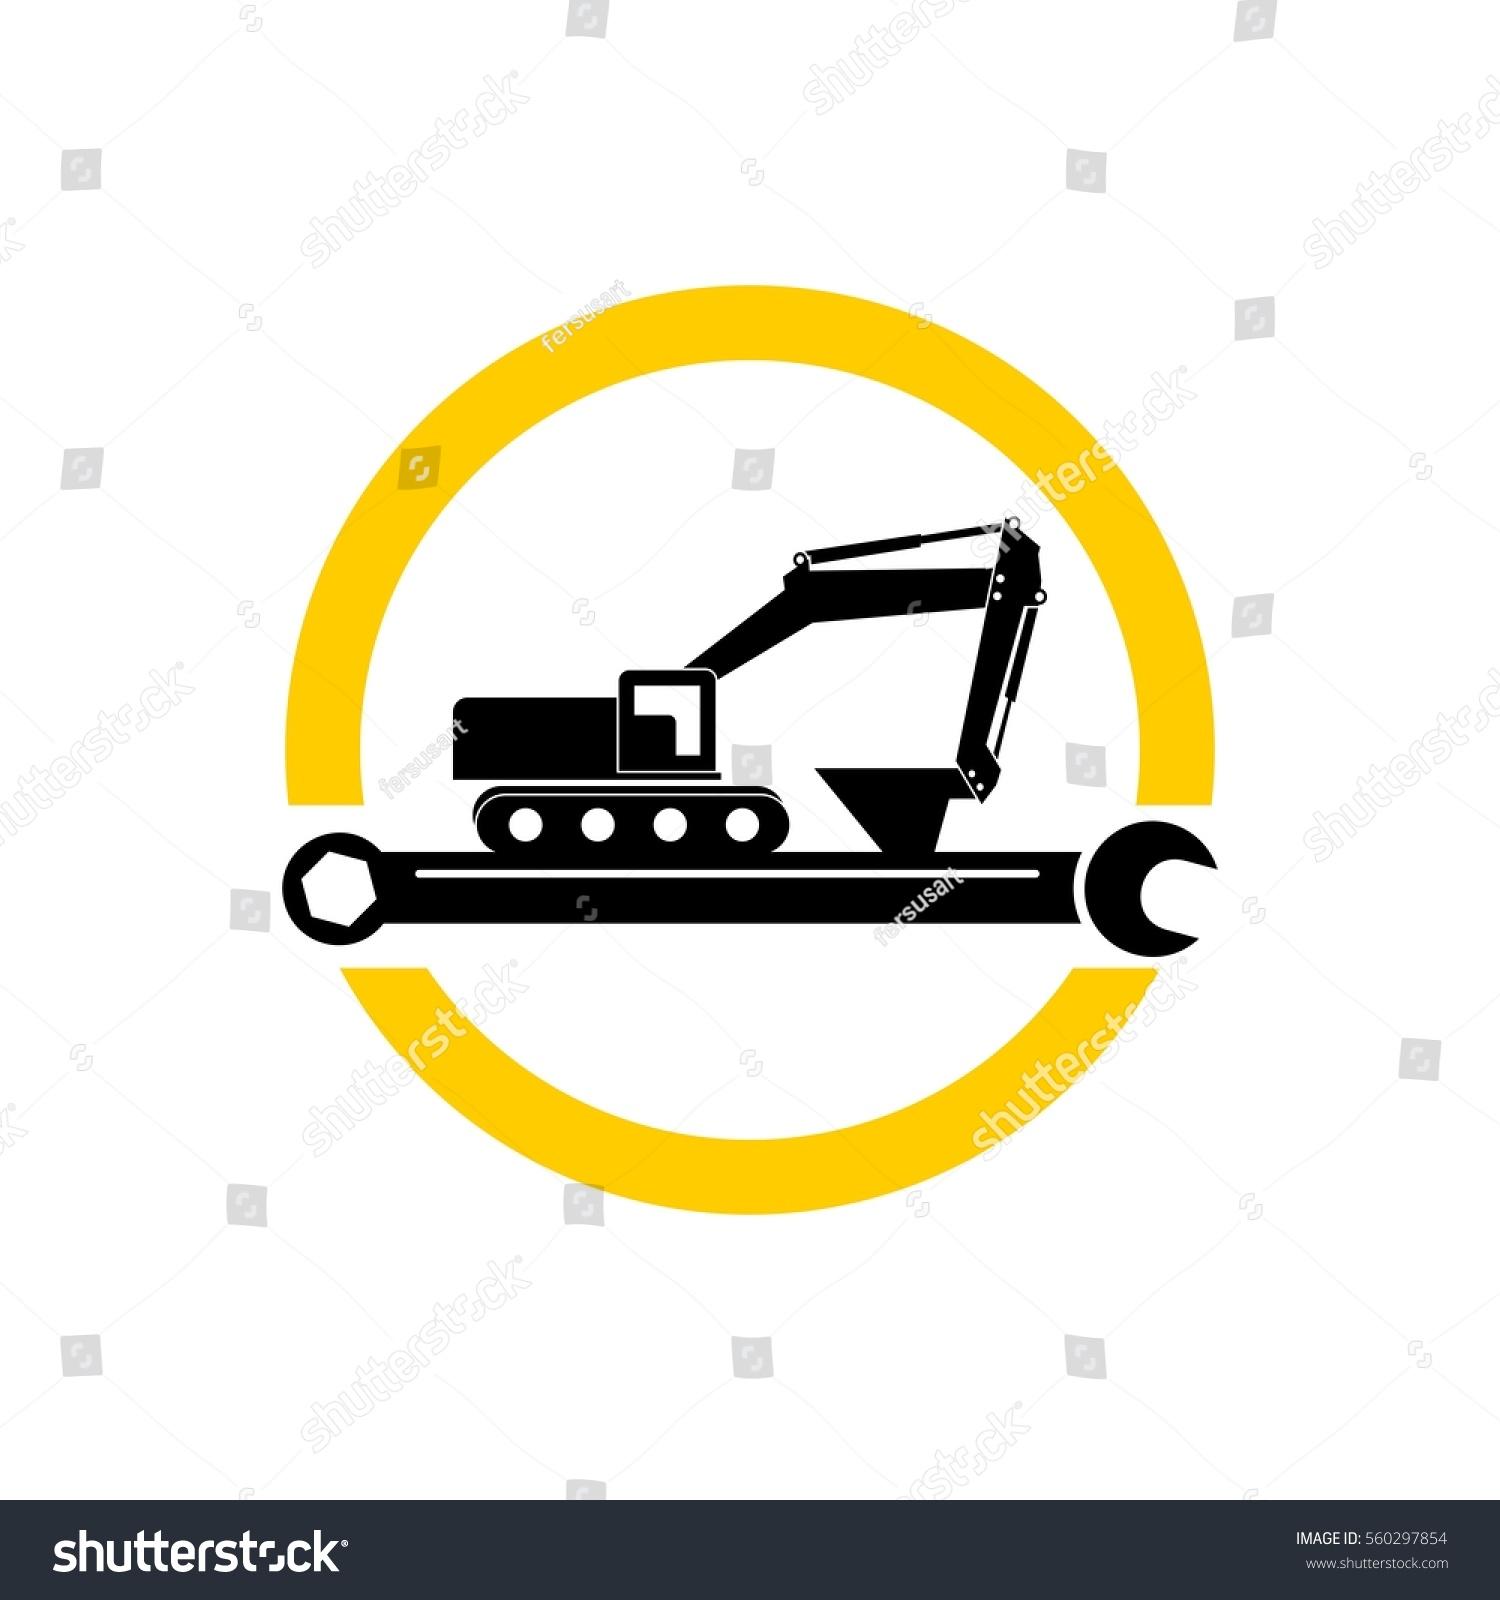 Excavator Service Logo Vector Stock Vector (Royalty Free) 560297854